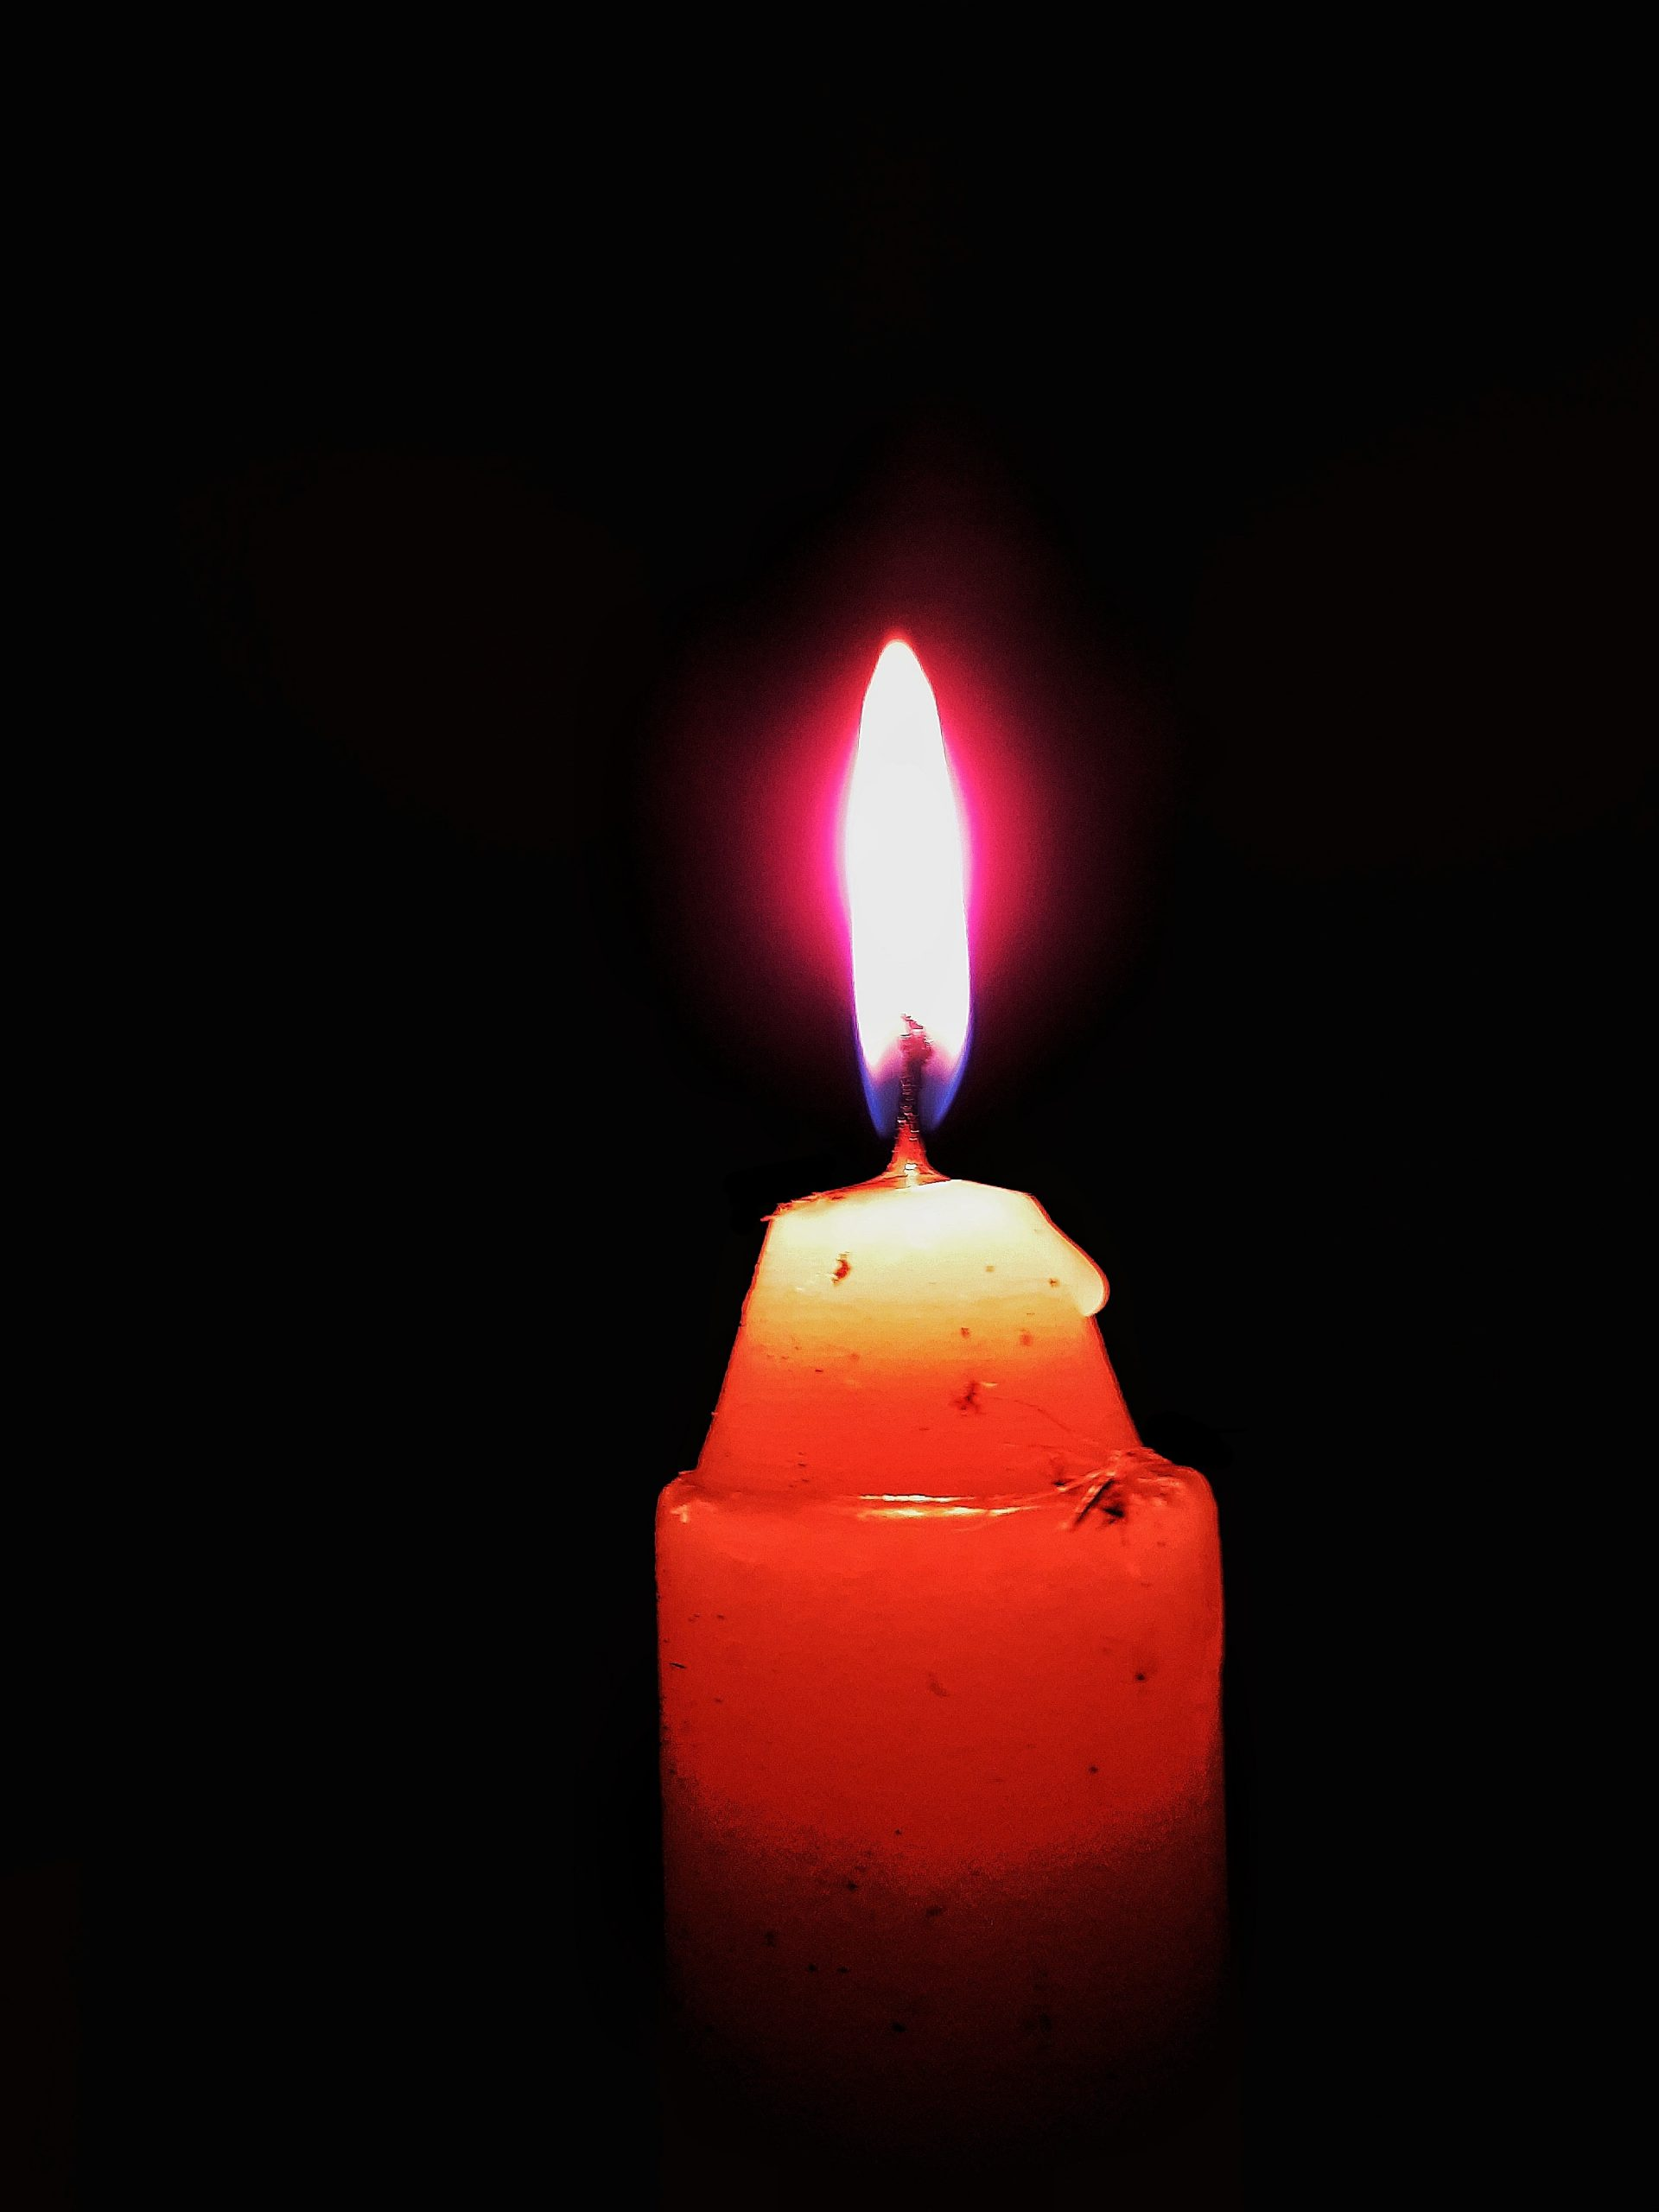 Candlight in the dark